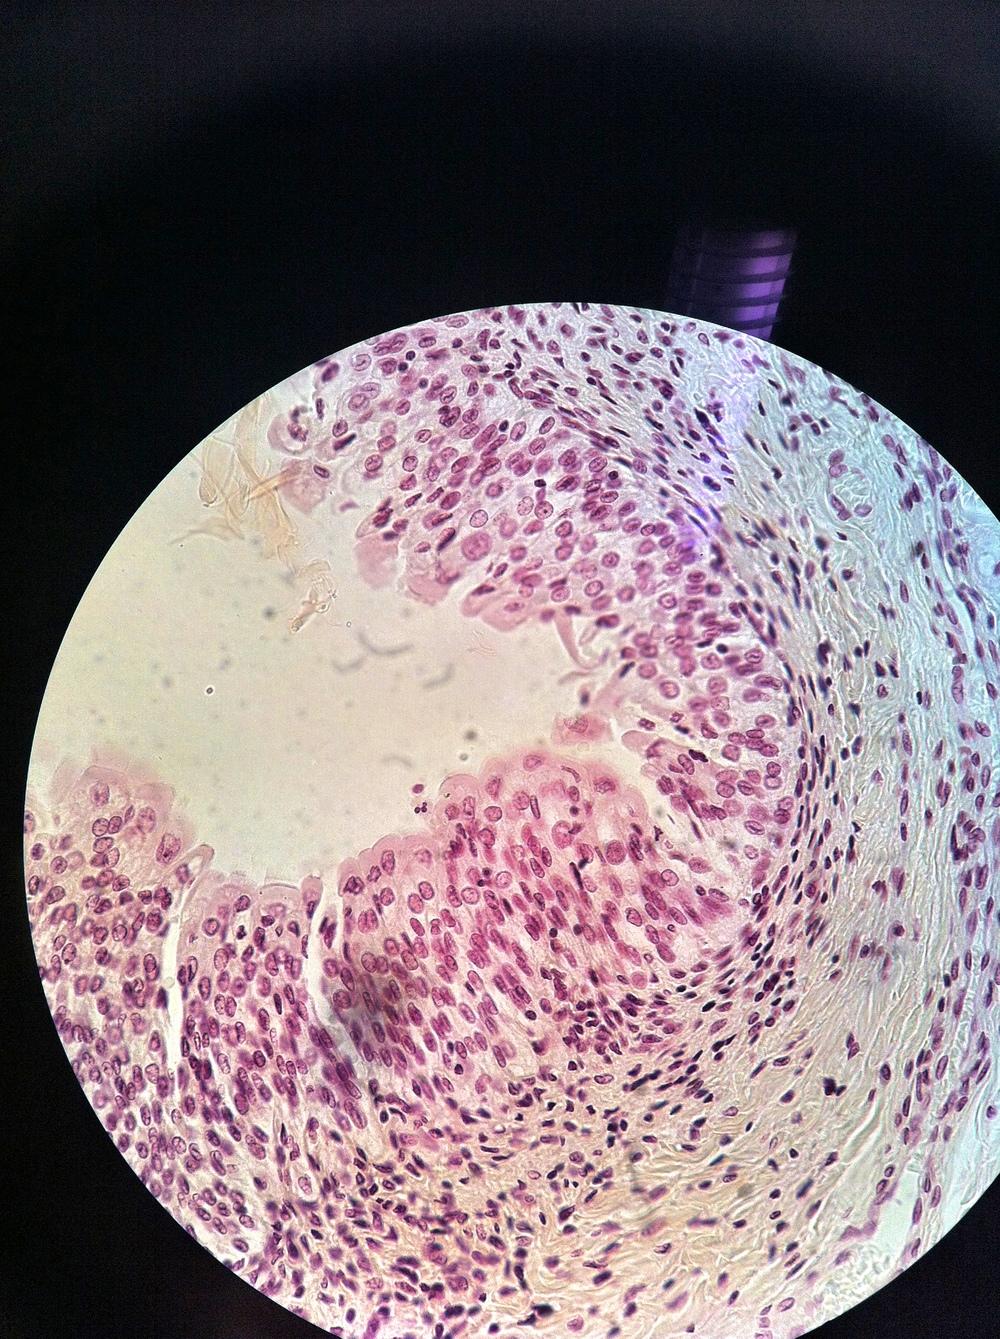 Bladder (transitional epithelium) 400X